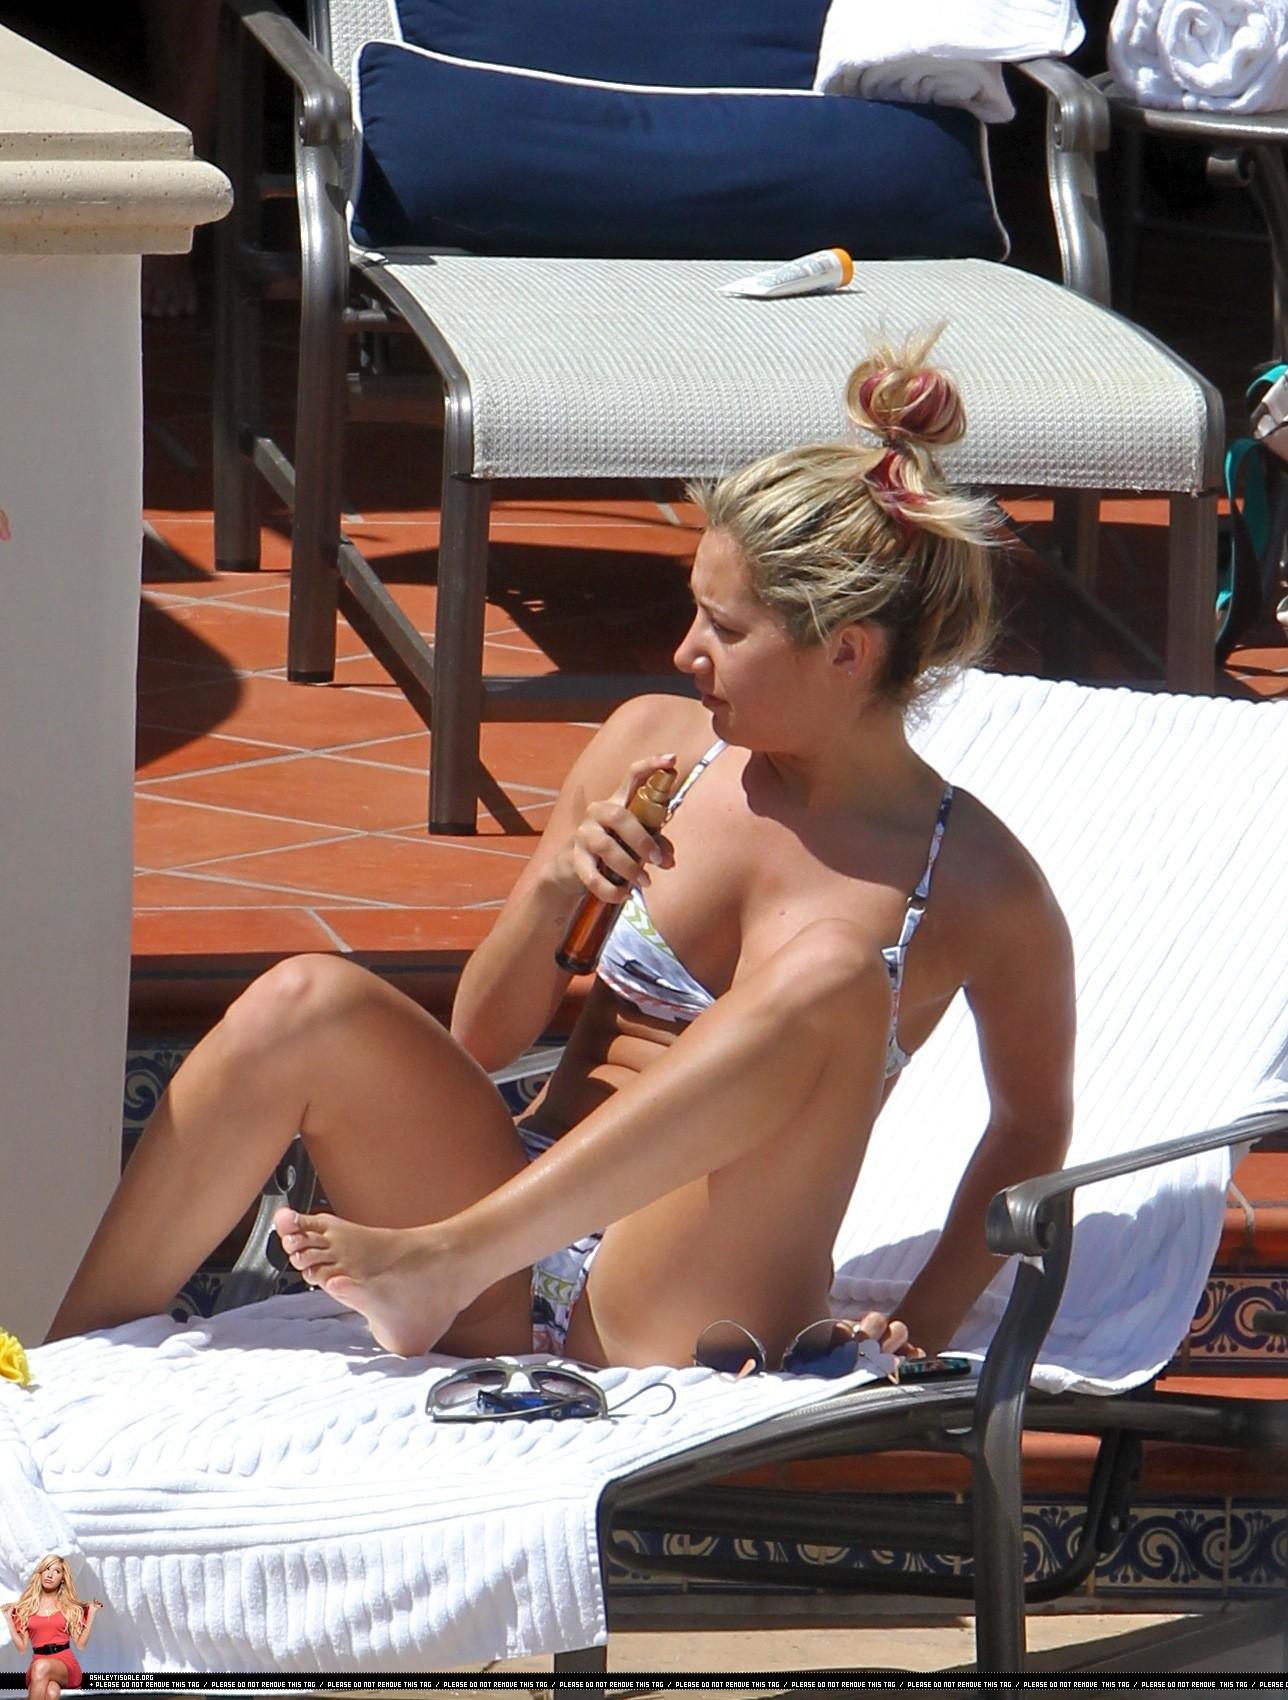 Topless girl on beach australia - 3 part 1